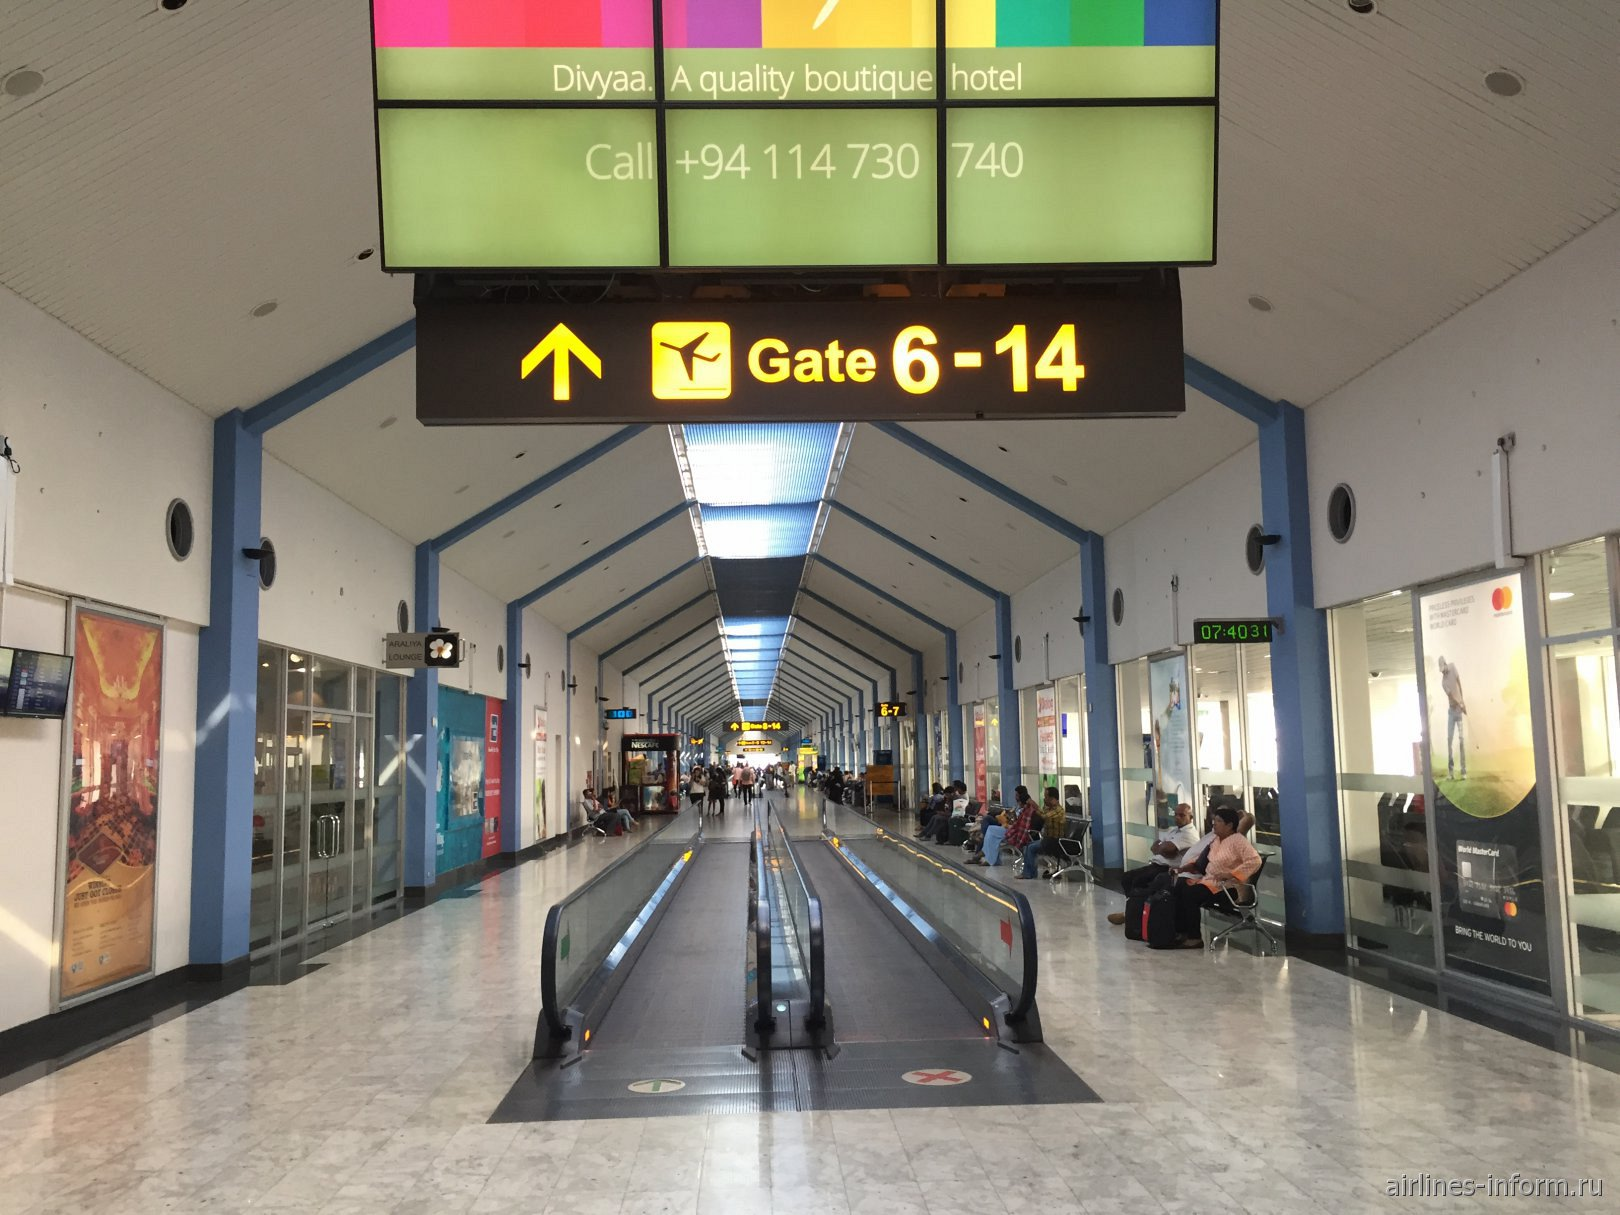 Галерея выходов на посадку в аэропорту Коломбо Бандаранайке